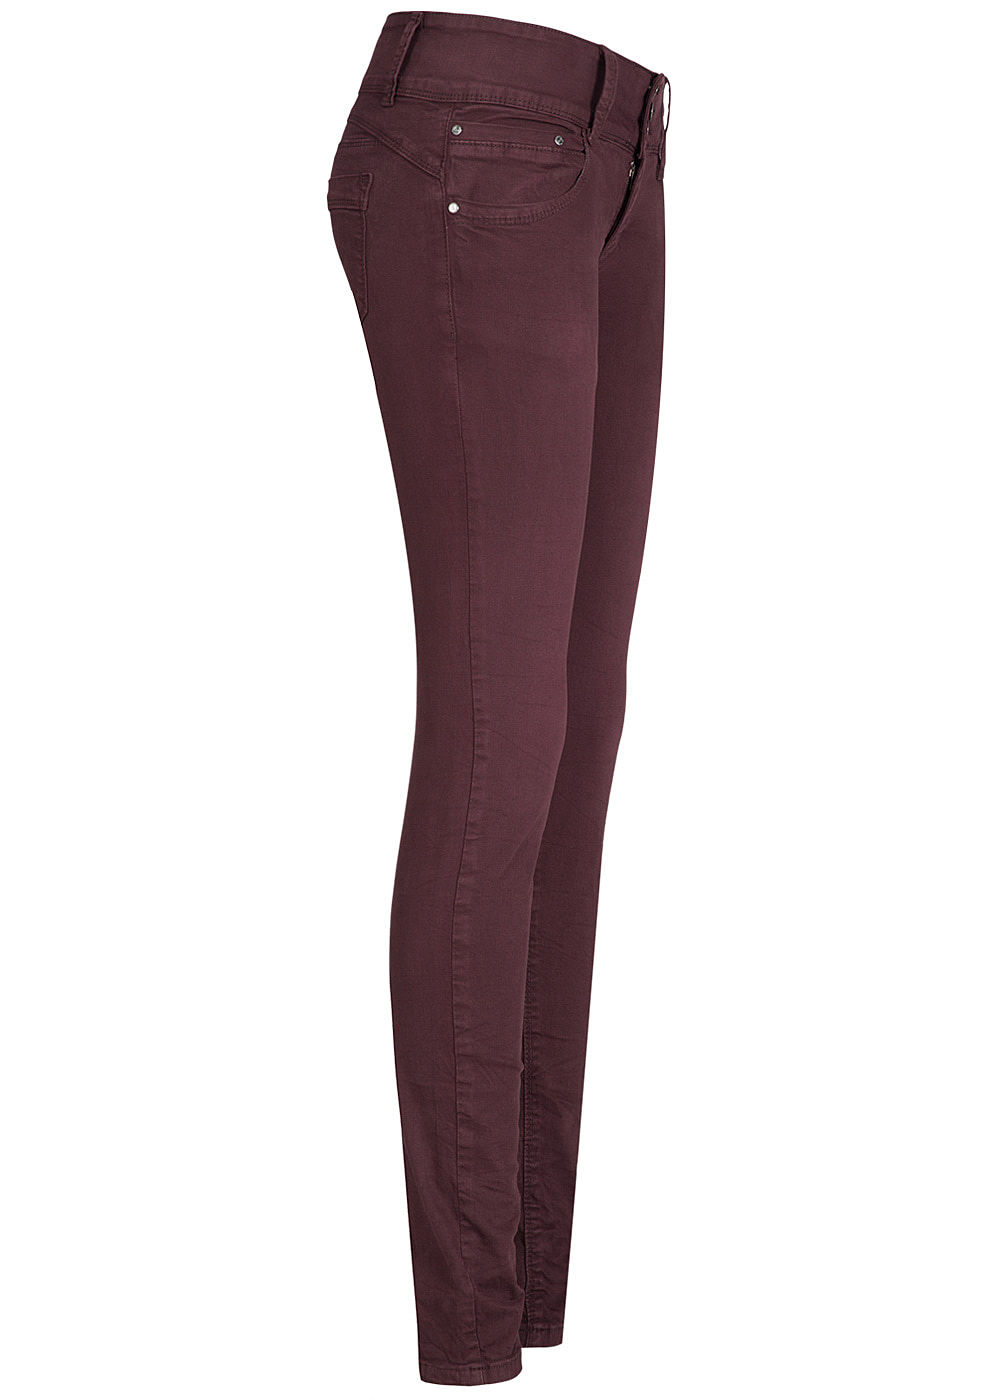 28e08e22eb42d9 Seventyseven Lifestyle Damen Jeans Hose 3er-Knopfleiste 5-Pockets ...